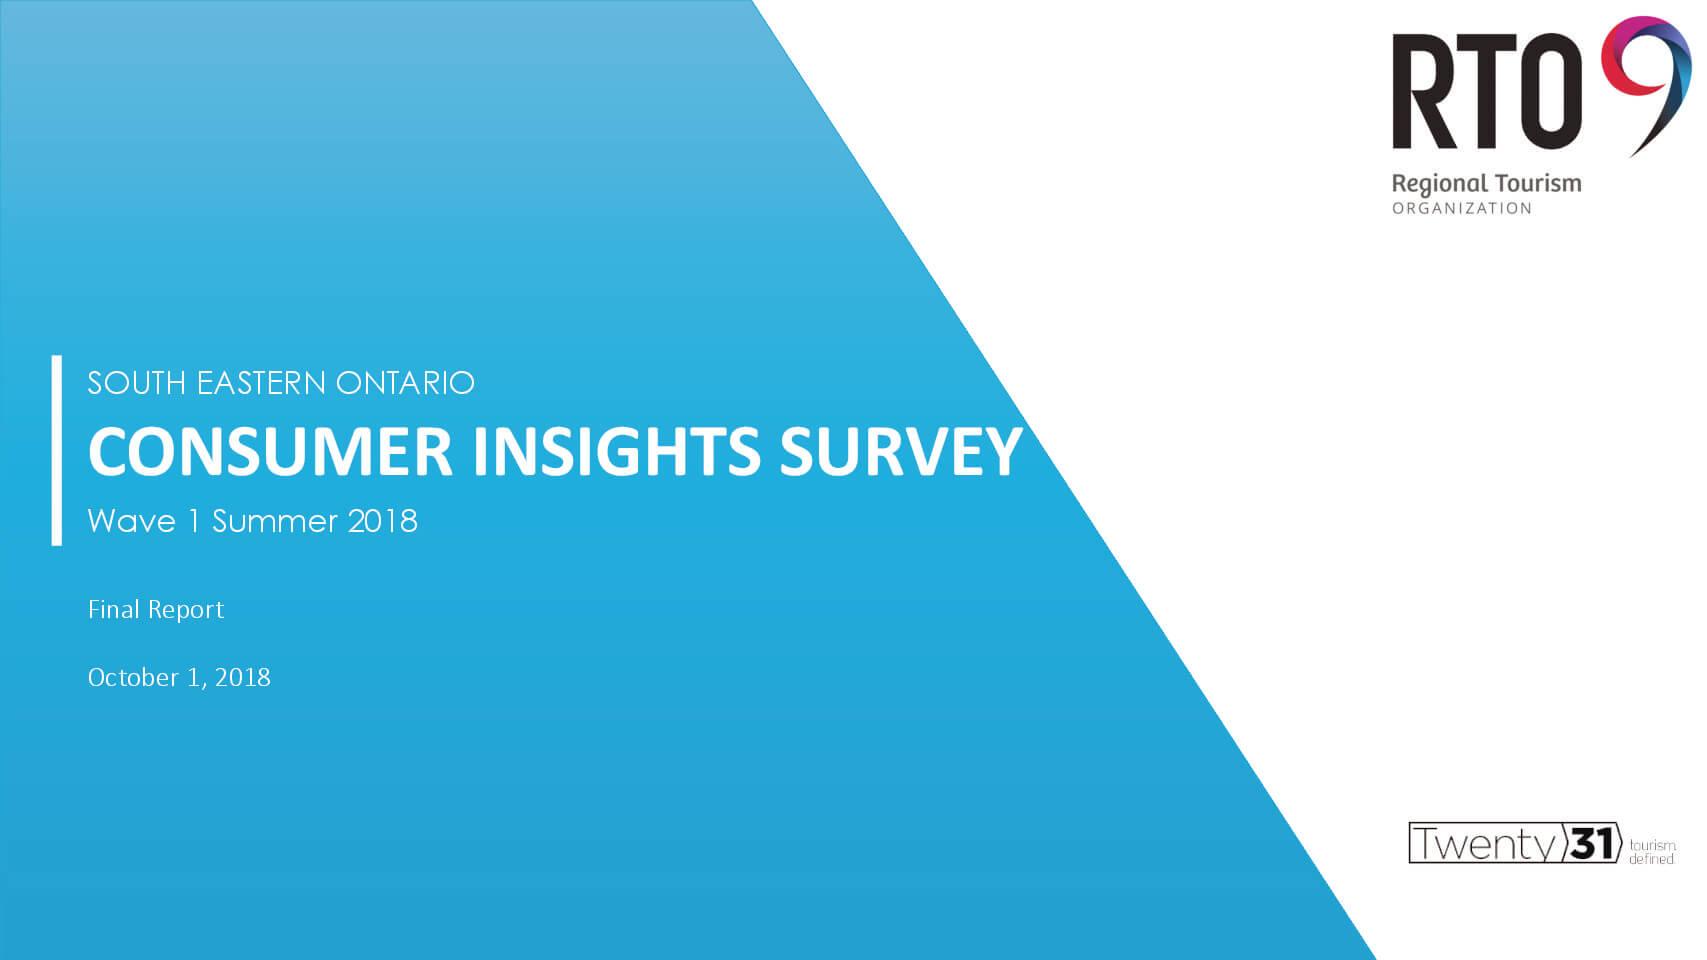 RTO9_Consumer-Insights-Survey_Final-Report_2018-pdf